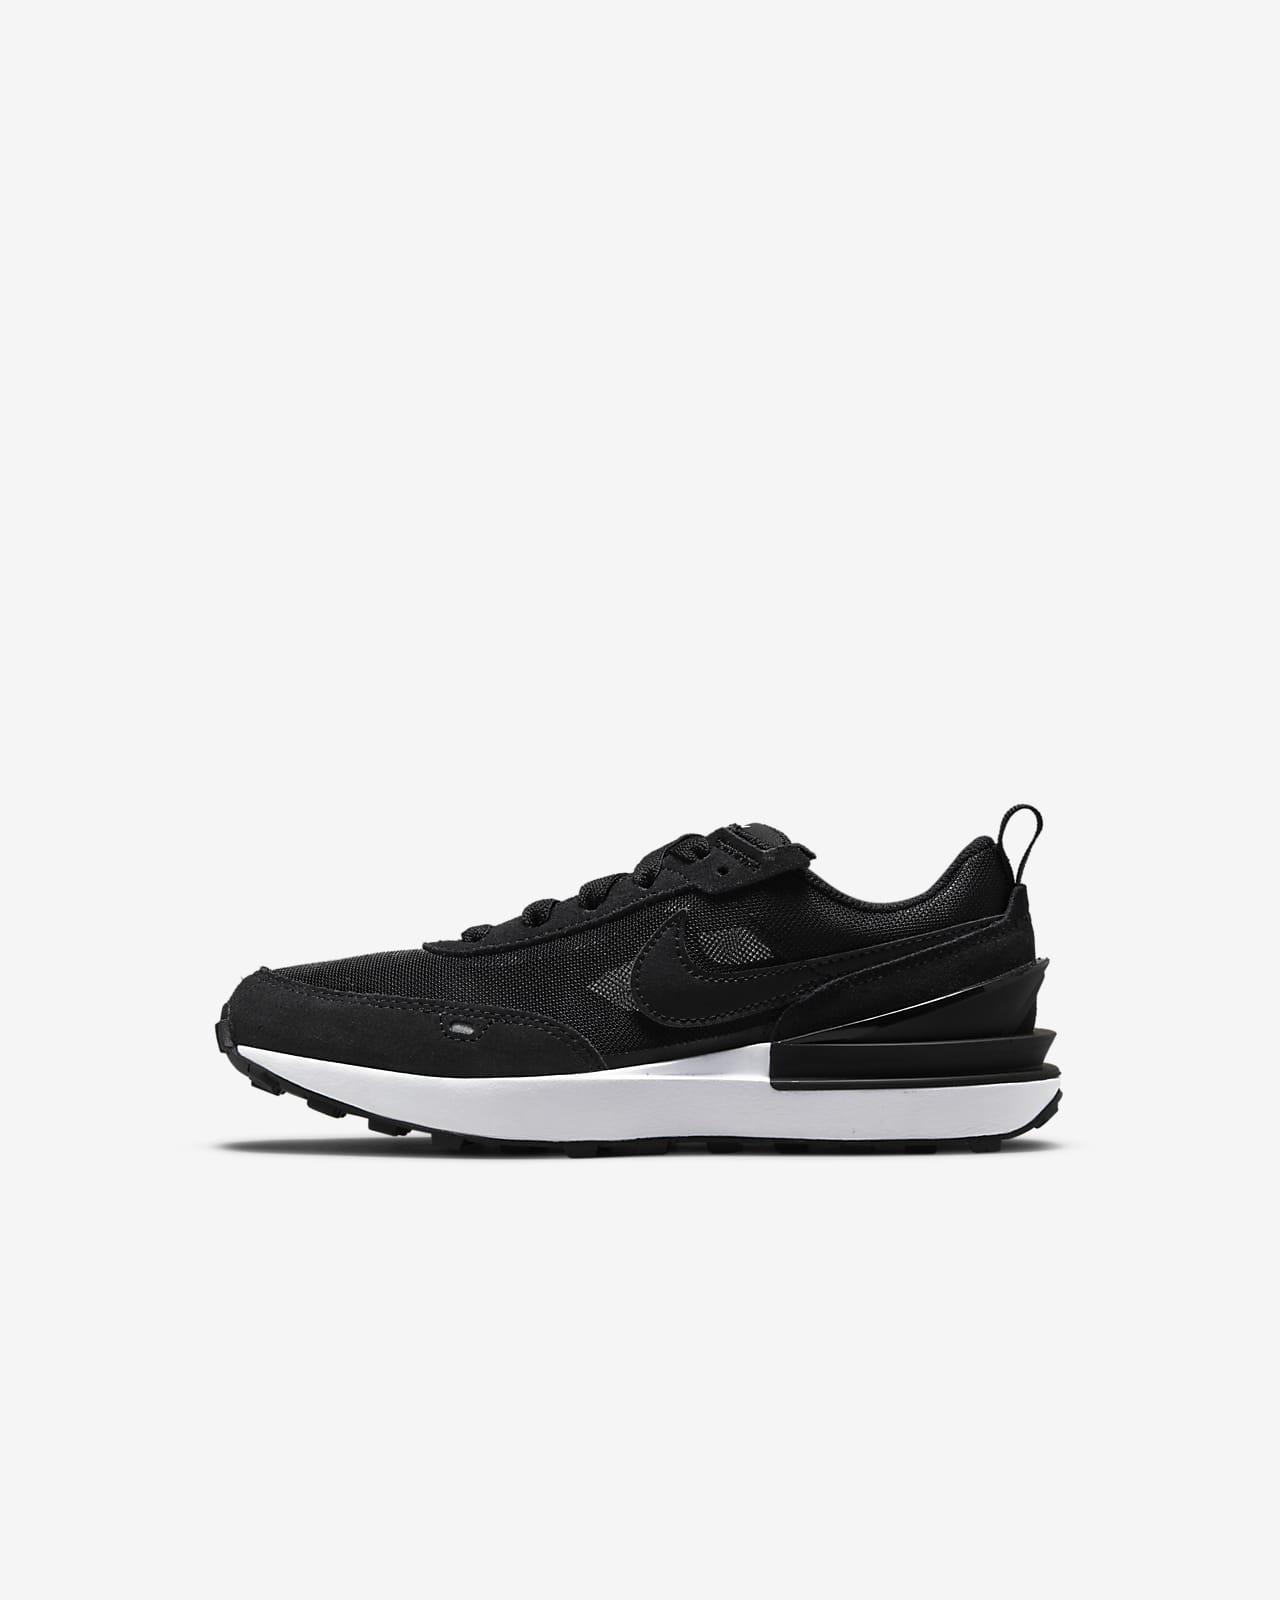 Nike Waffle One (PS) 幼童运动童鞋